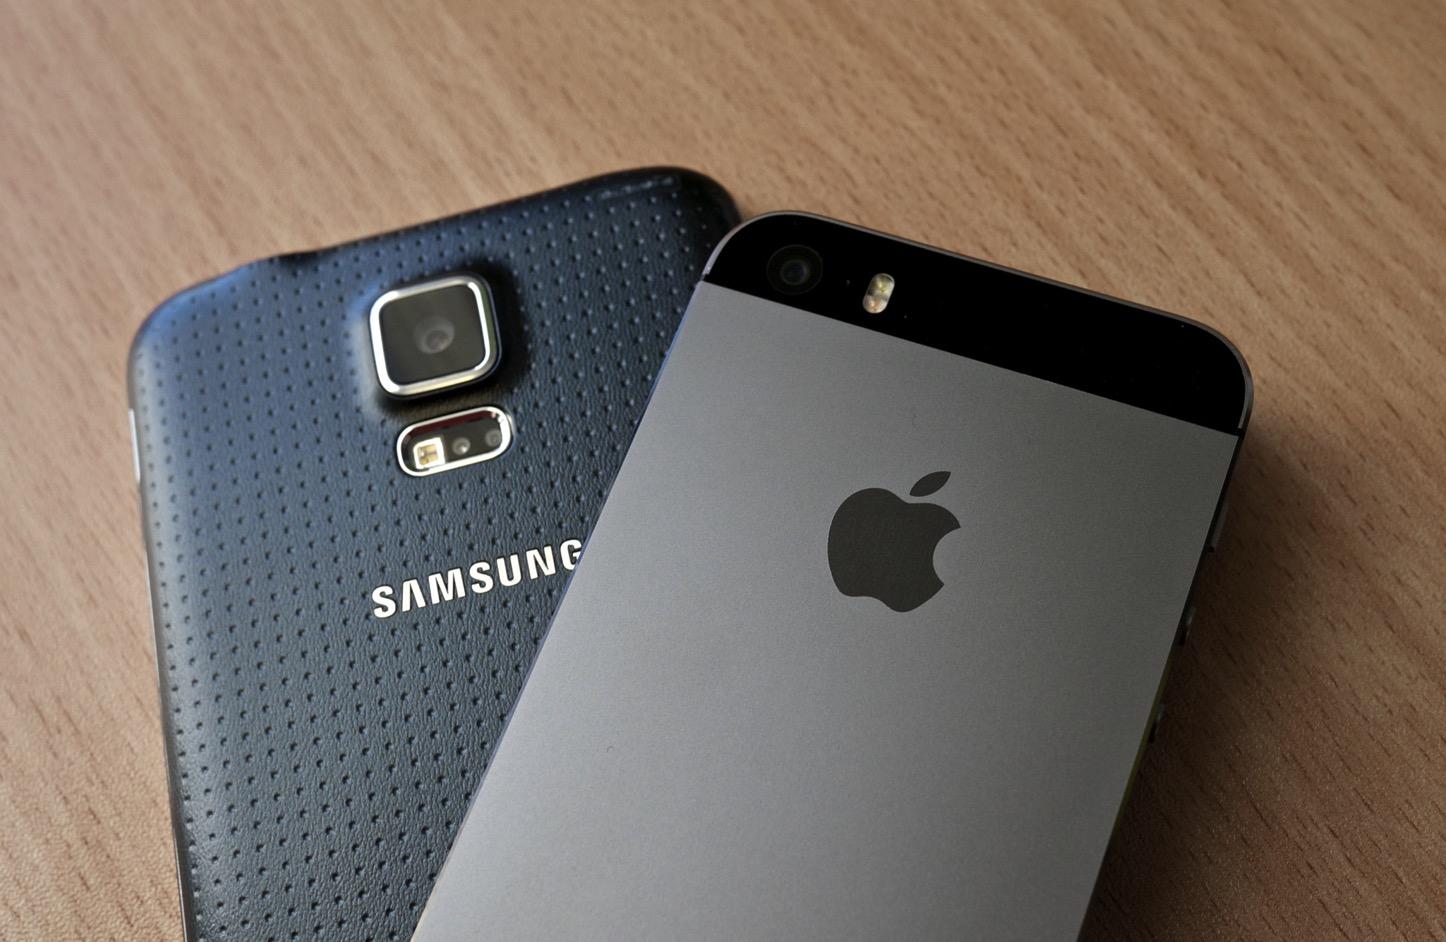 iphone-and-samsung.jpg